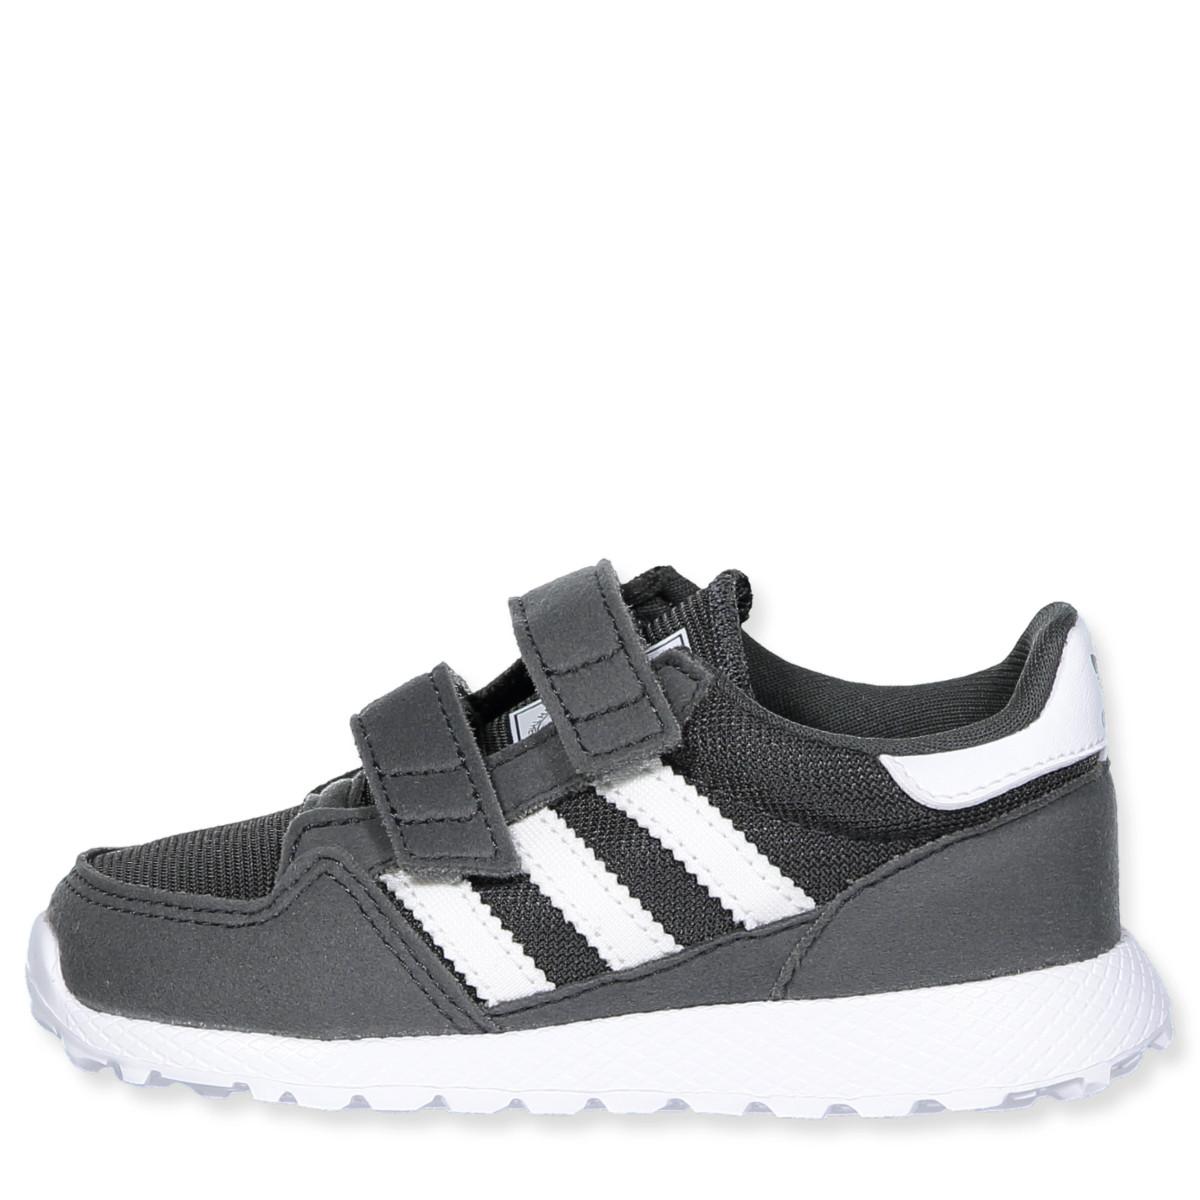 Adidas Forest Grove CF (I)